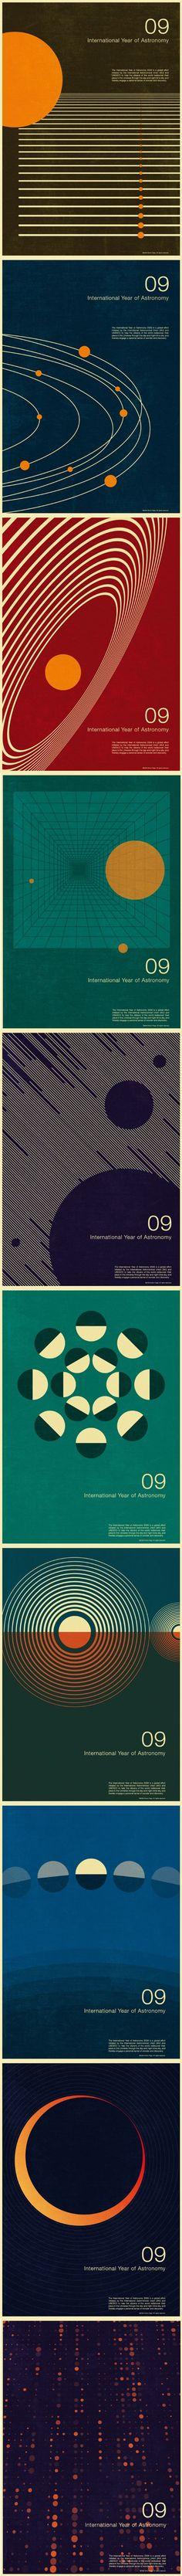 Bauhaus astronomy luv International Year of Astronomy print series, Simon C Page, 2009 Graphisches Design, Swiss Design, Retro Design, Book Design, Layout Design, Print Design, Poster Design, Graphic Design Posters, Graphic Design Typography